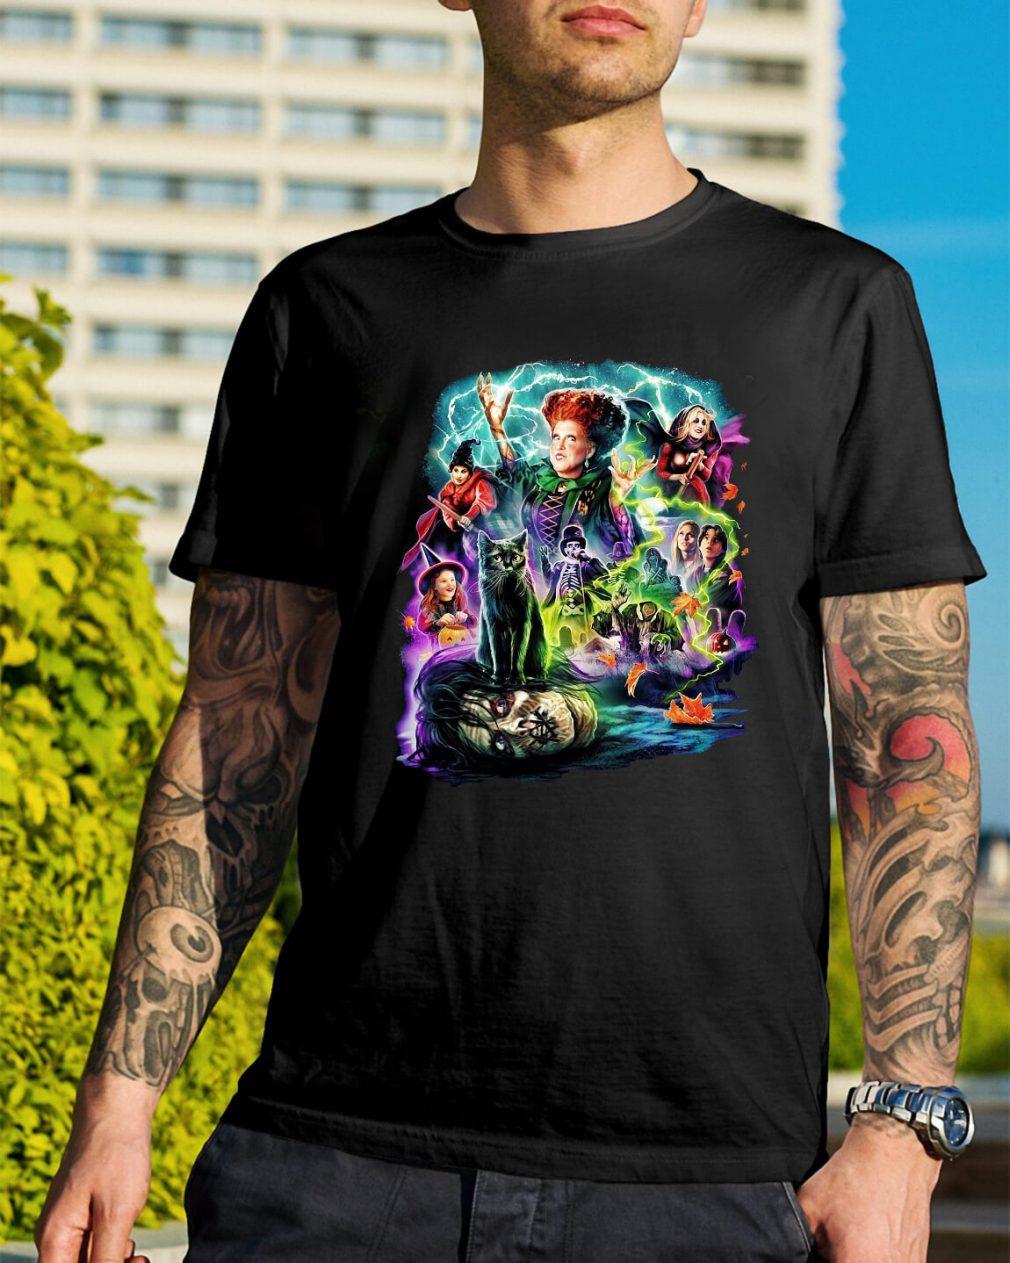 Cavity colors Hocus Pocus shirt